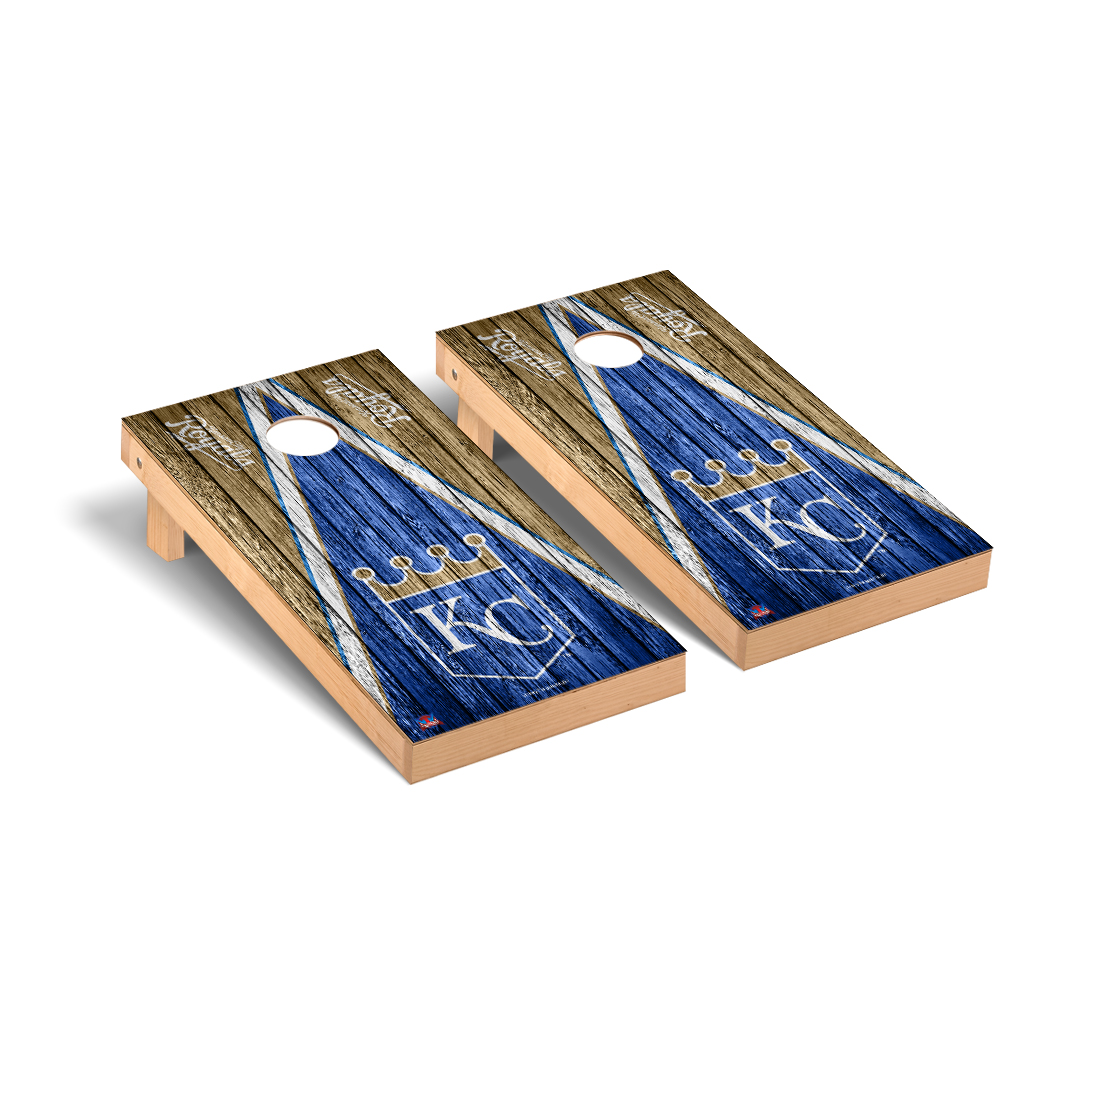 Kansas City Royals MLB Baseball Cornhole Game Set Triangle Weathered Version